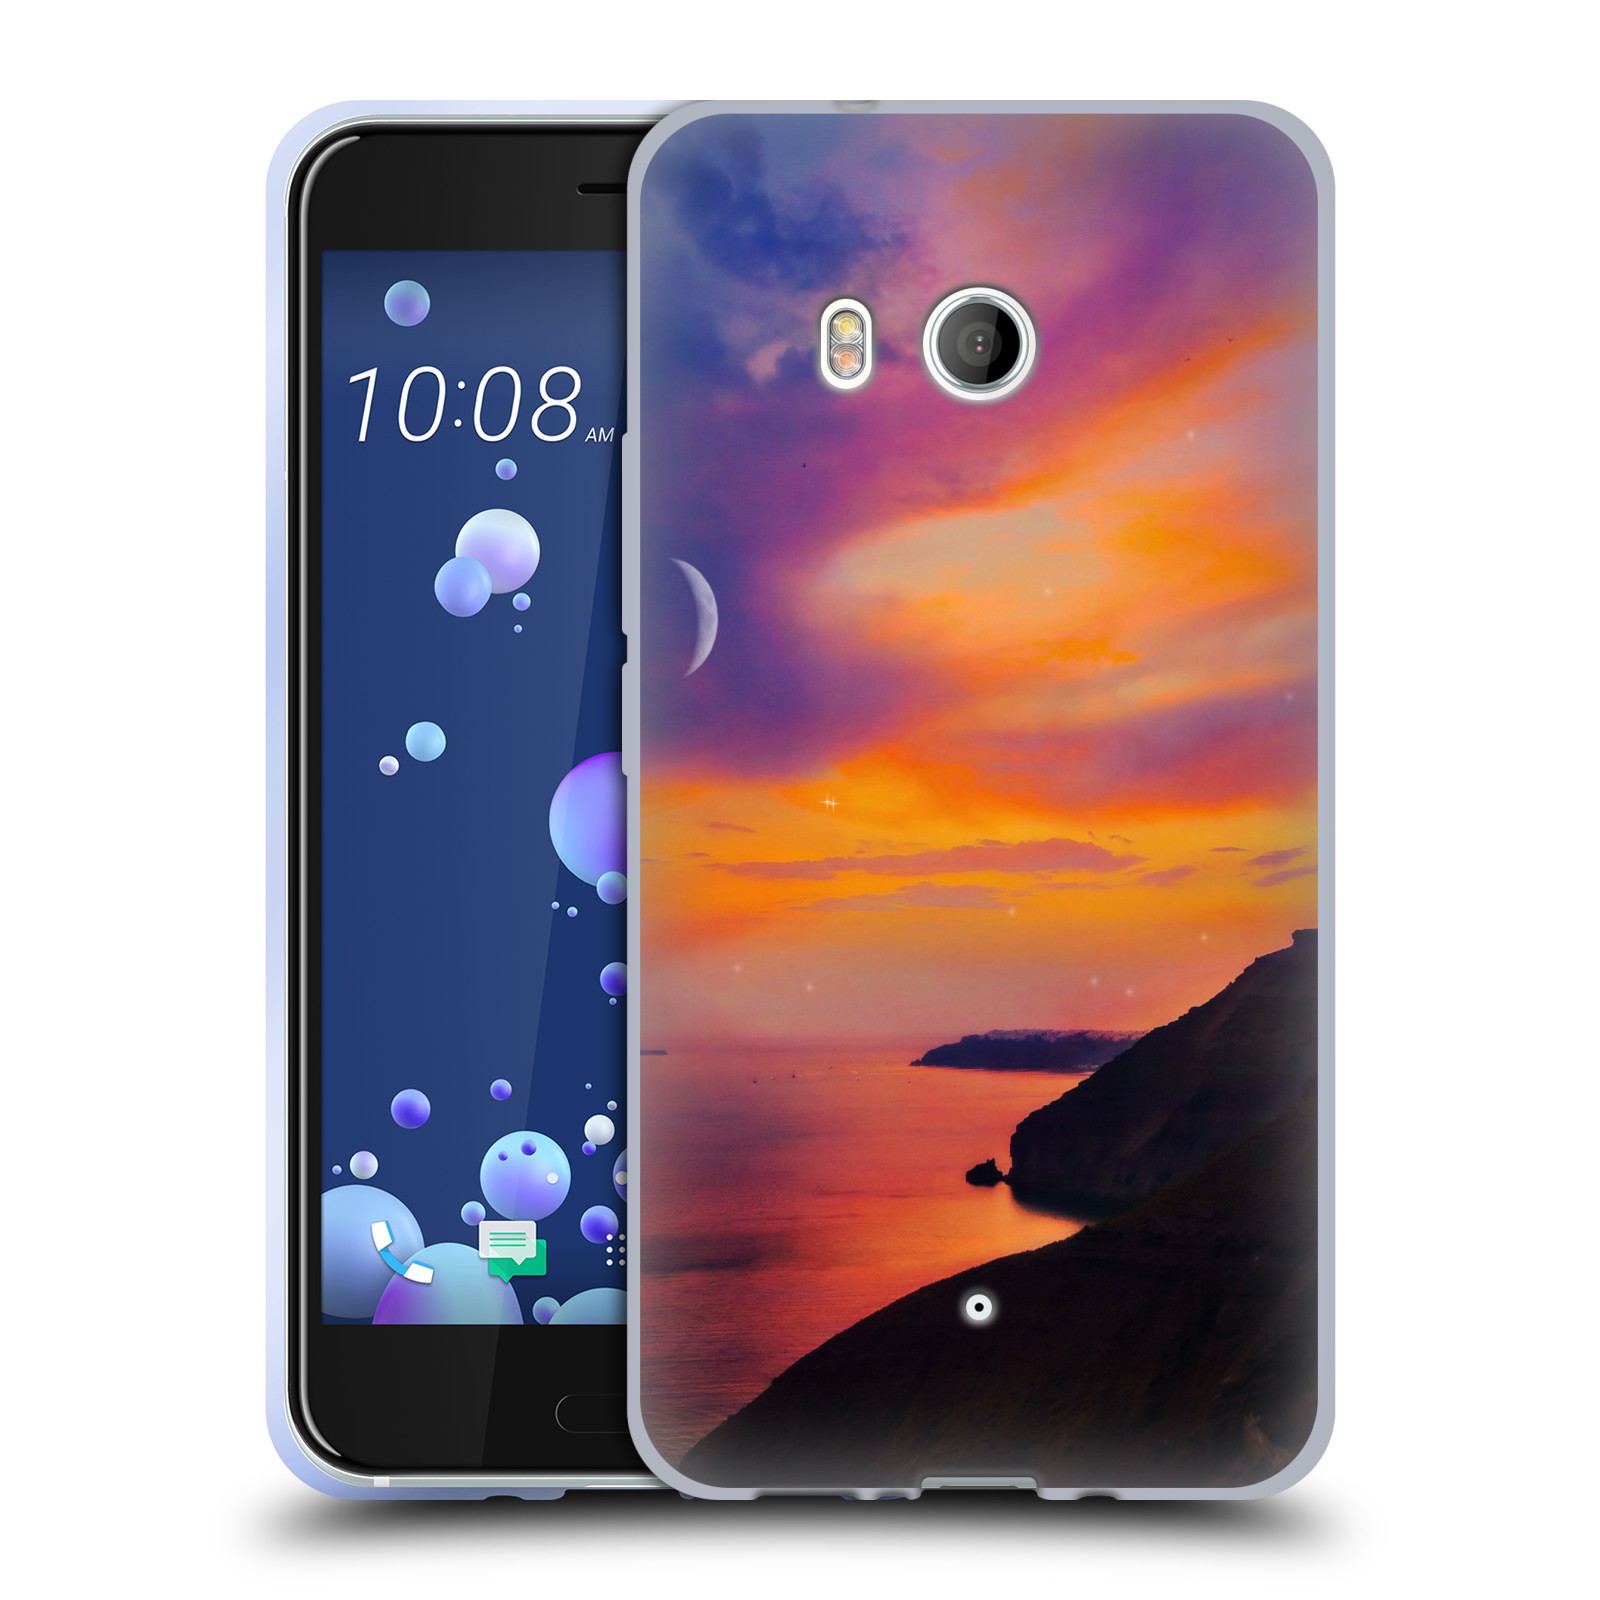 UFFICIALE-HAROULITA-SANTORINI-NUVOLE-COVER-MORBIDA-IN-GEL-PER-HTC-TELEFONI-1